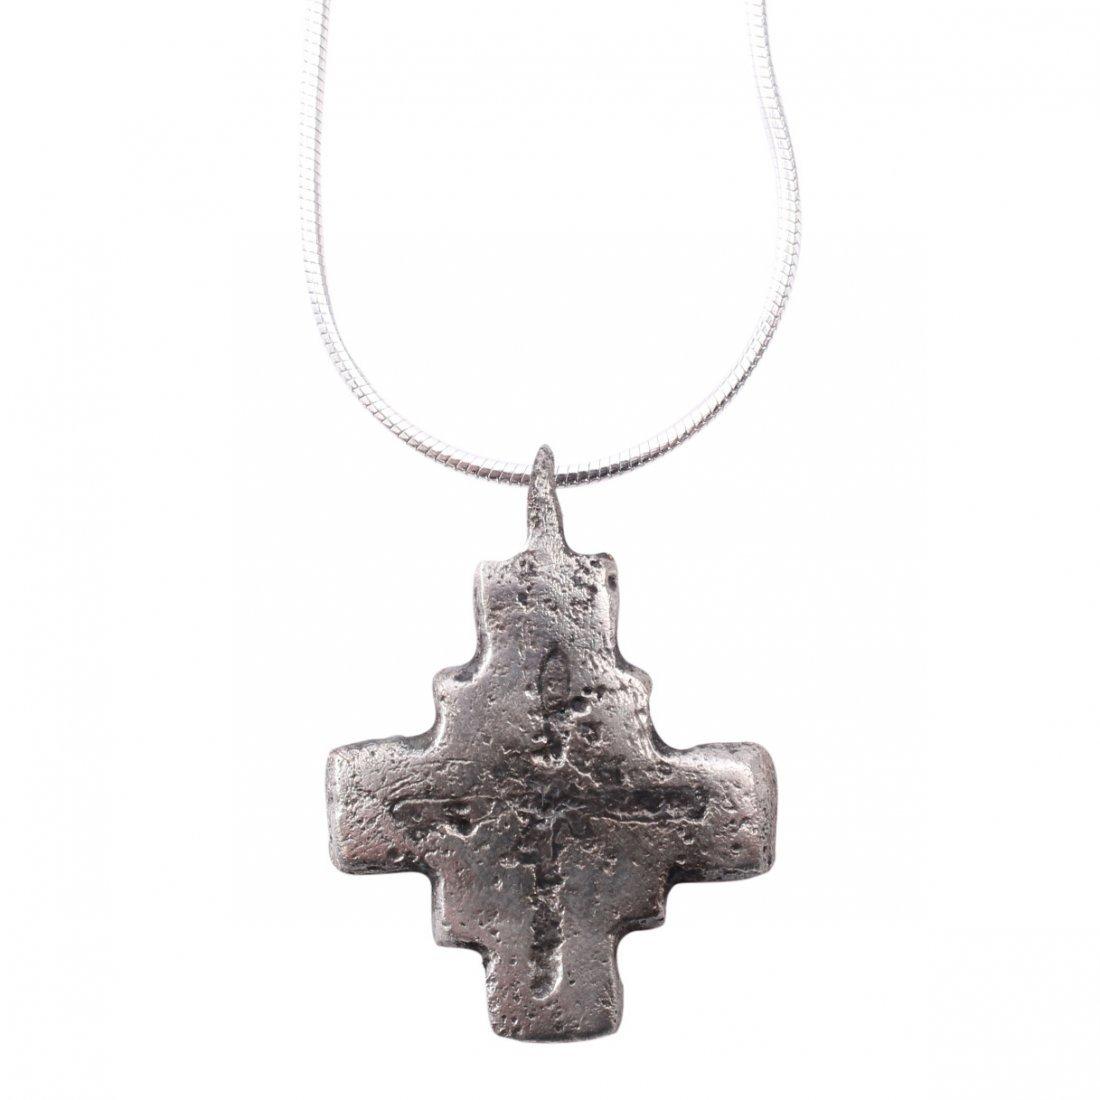 Byzantine Pilgrim's Reliquary Cross 6-9th C